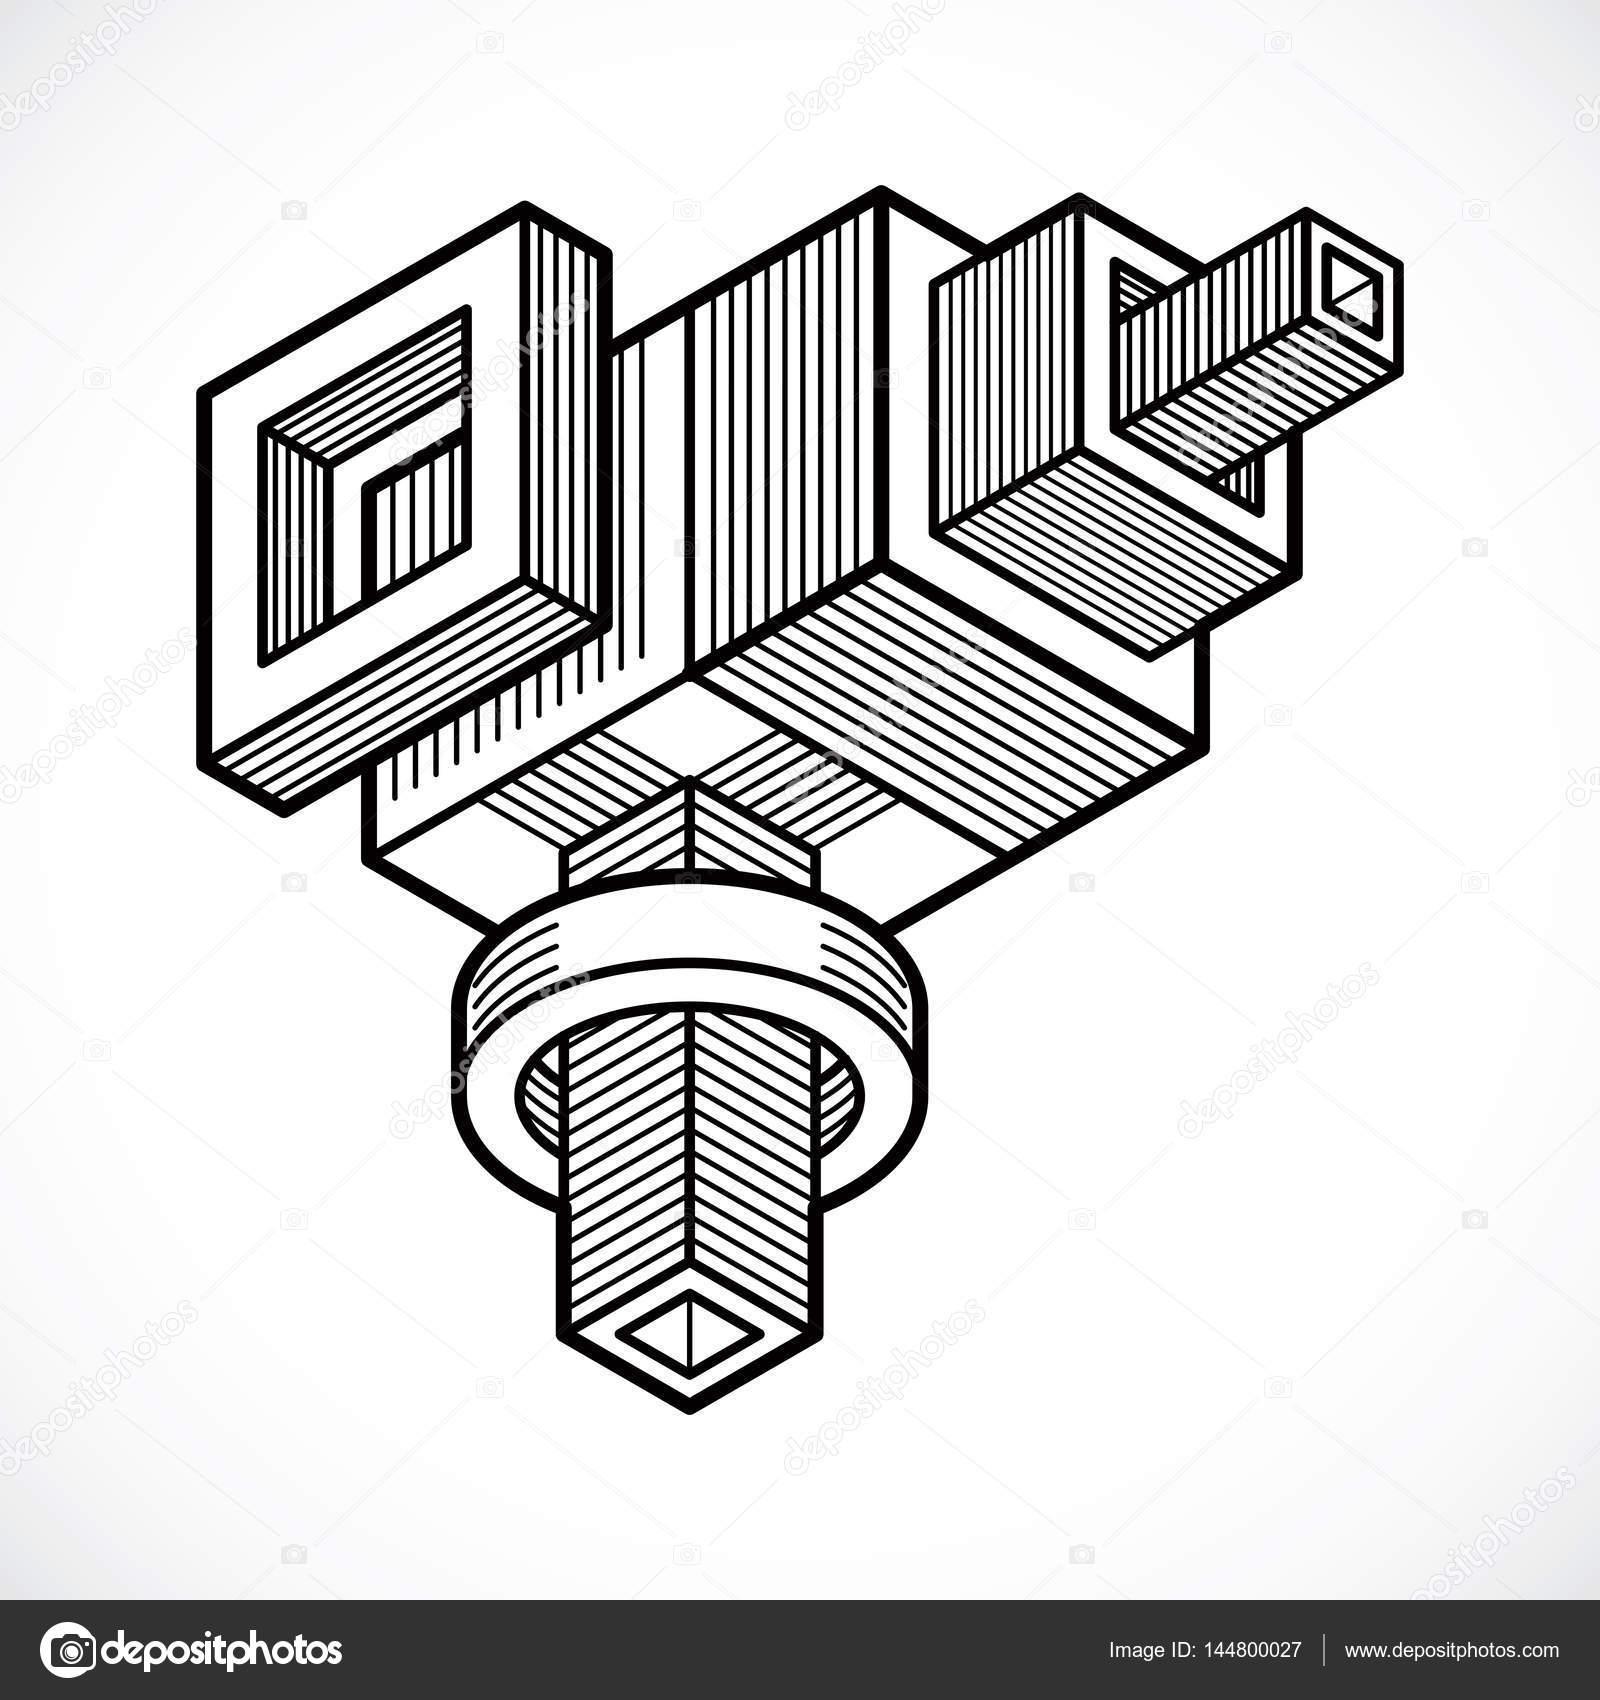 3d 设计,抽象矢量三维立方体形状– 图库插图